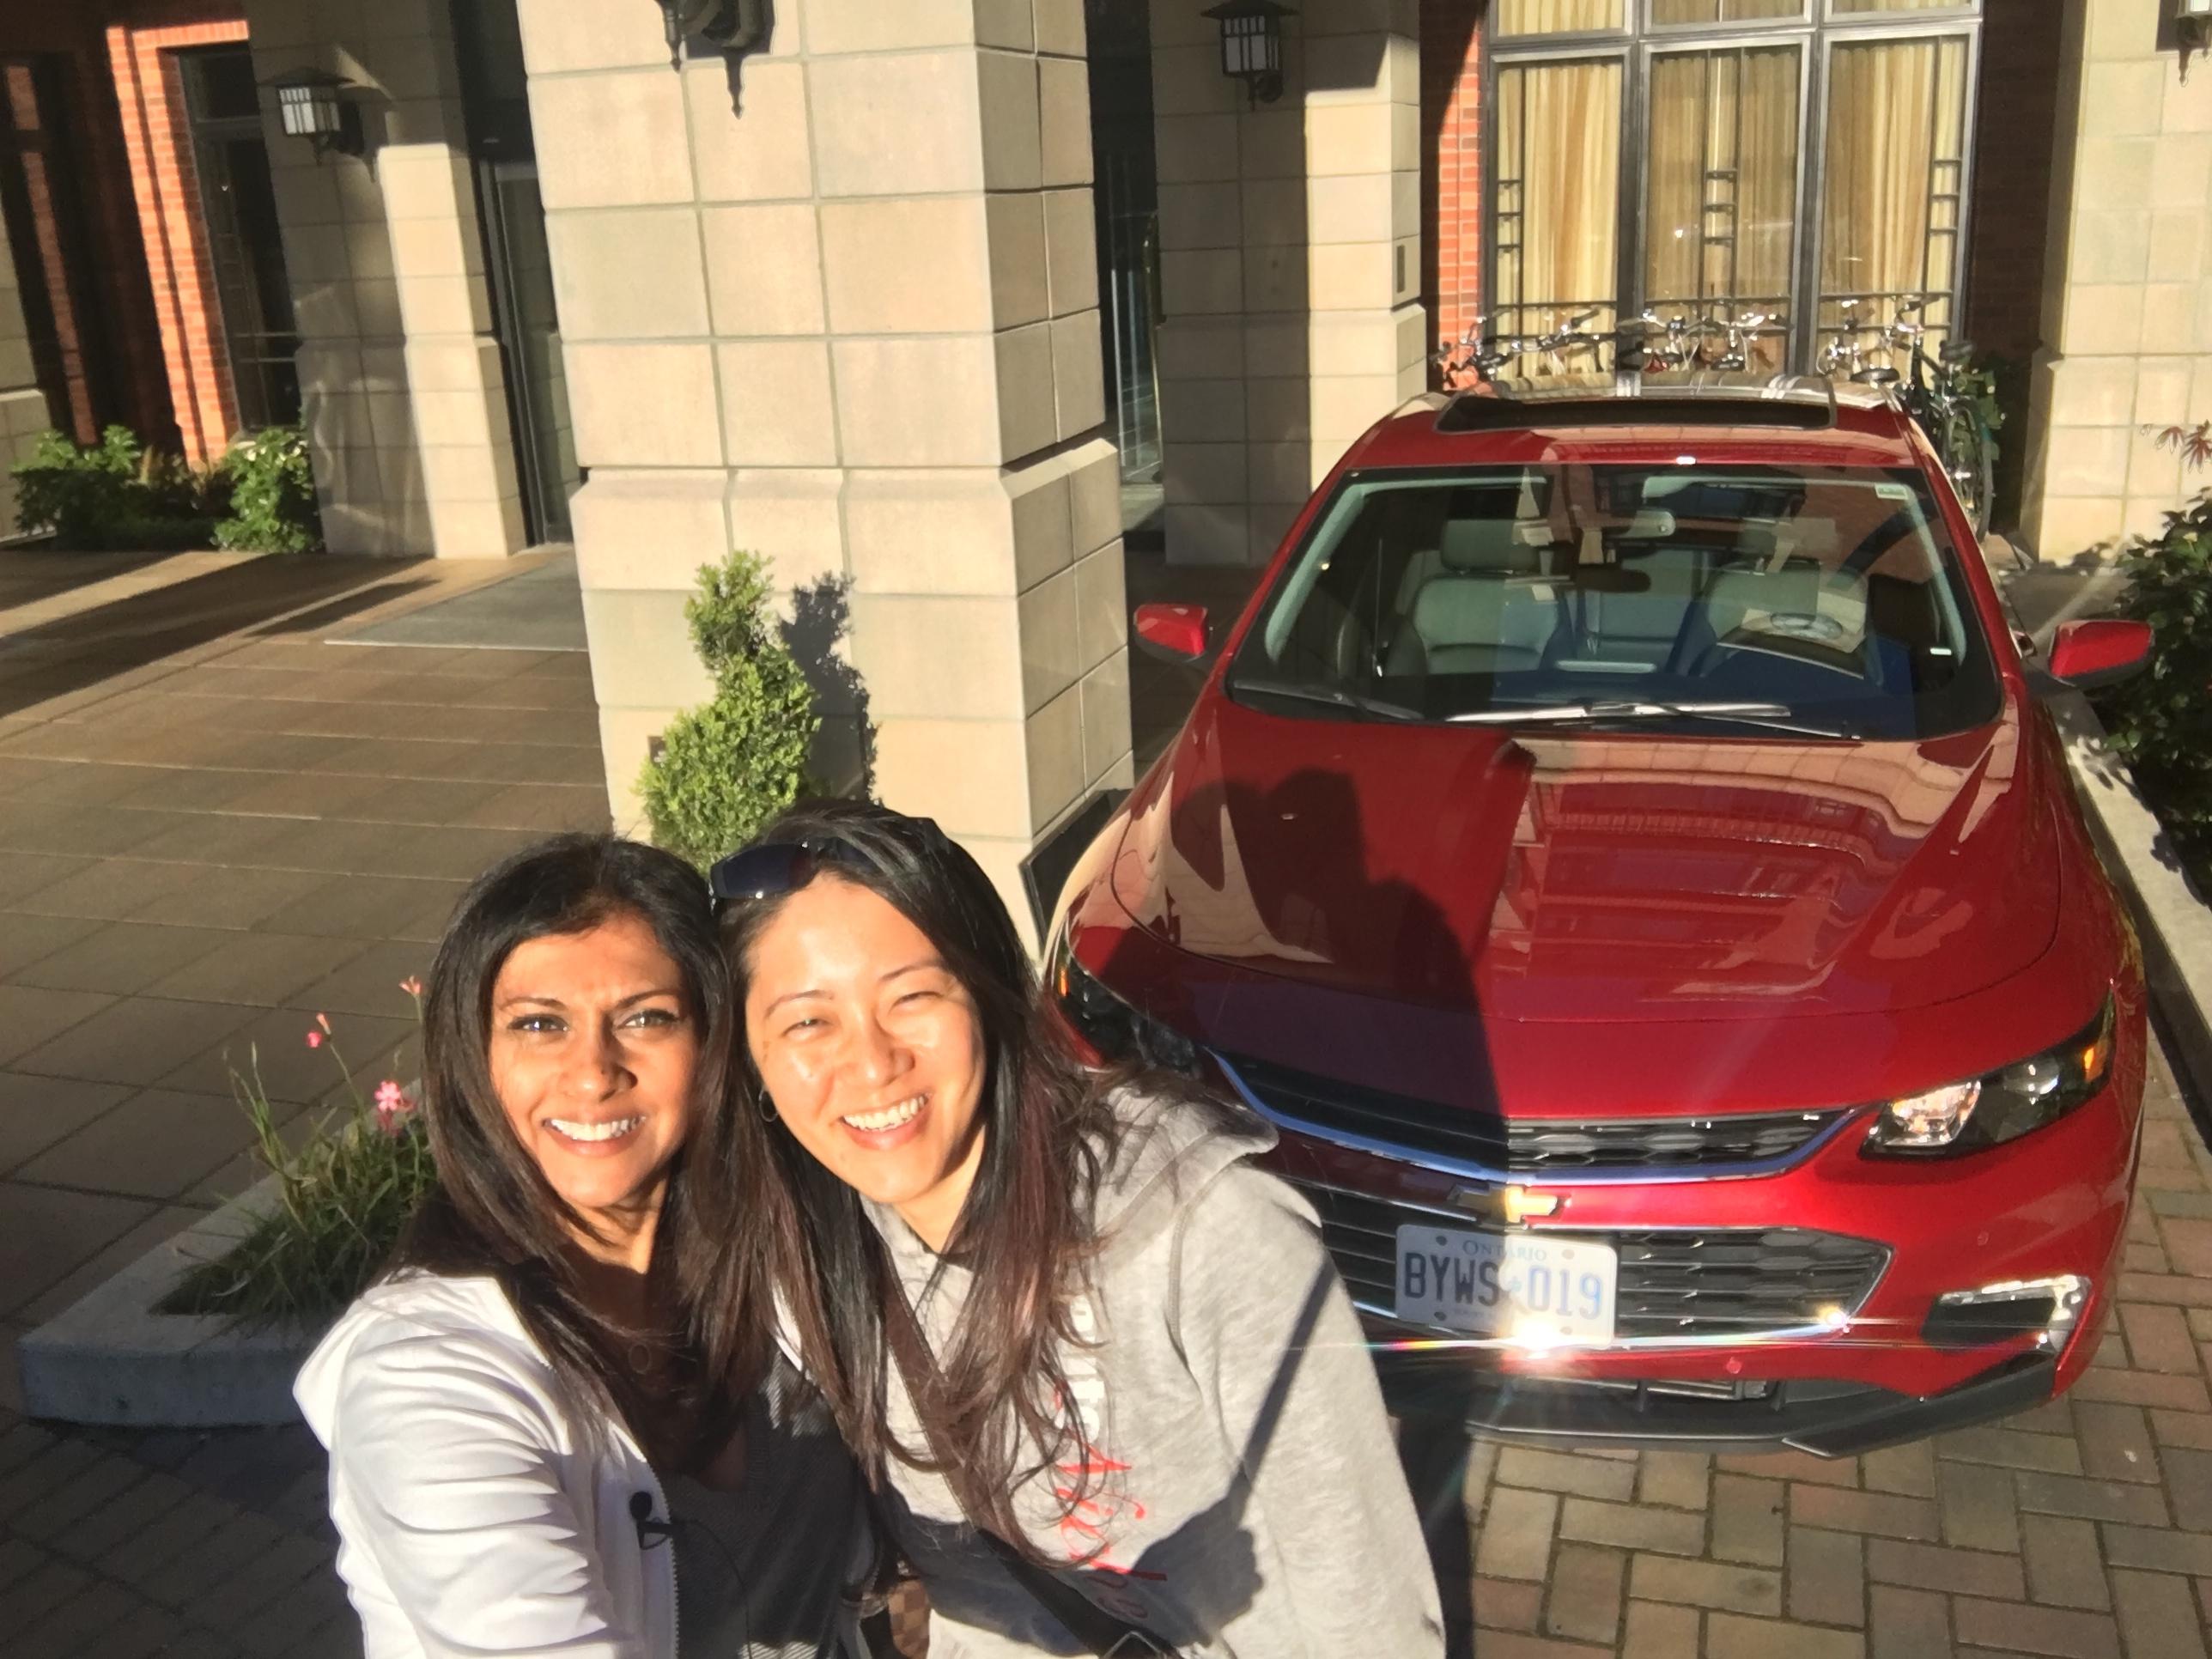 Journalists: Karen Johnson @karenjohnsontv and Emily Chung of @autonicheInc enjoying our ride